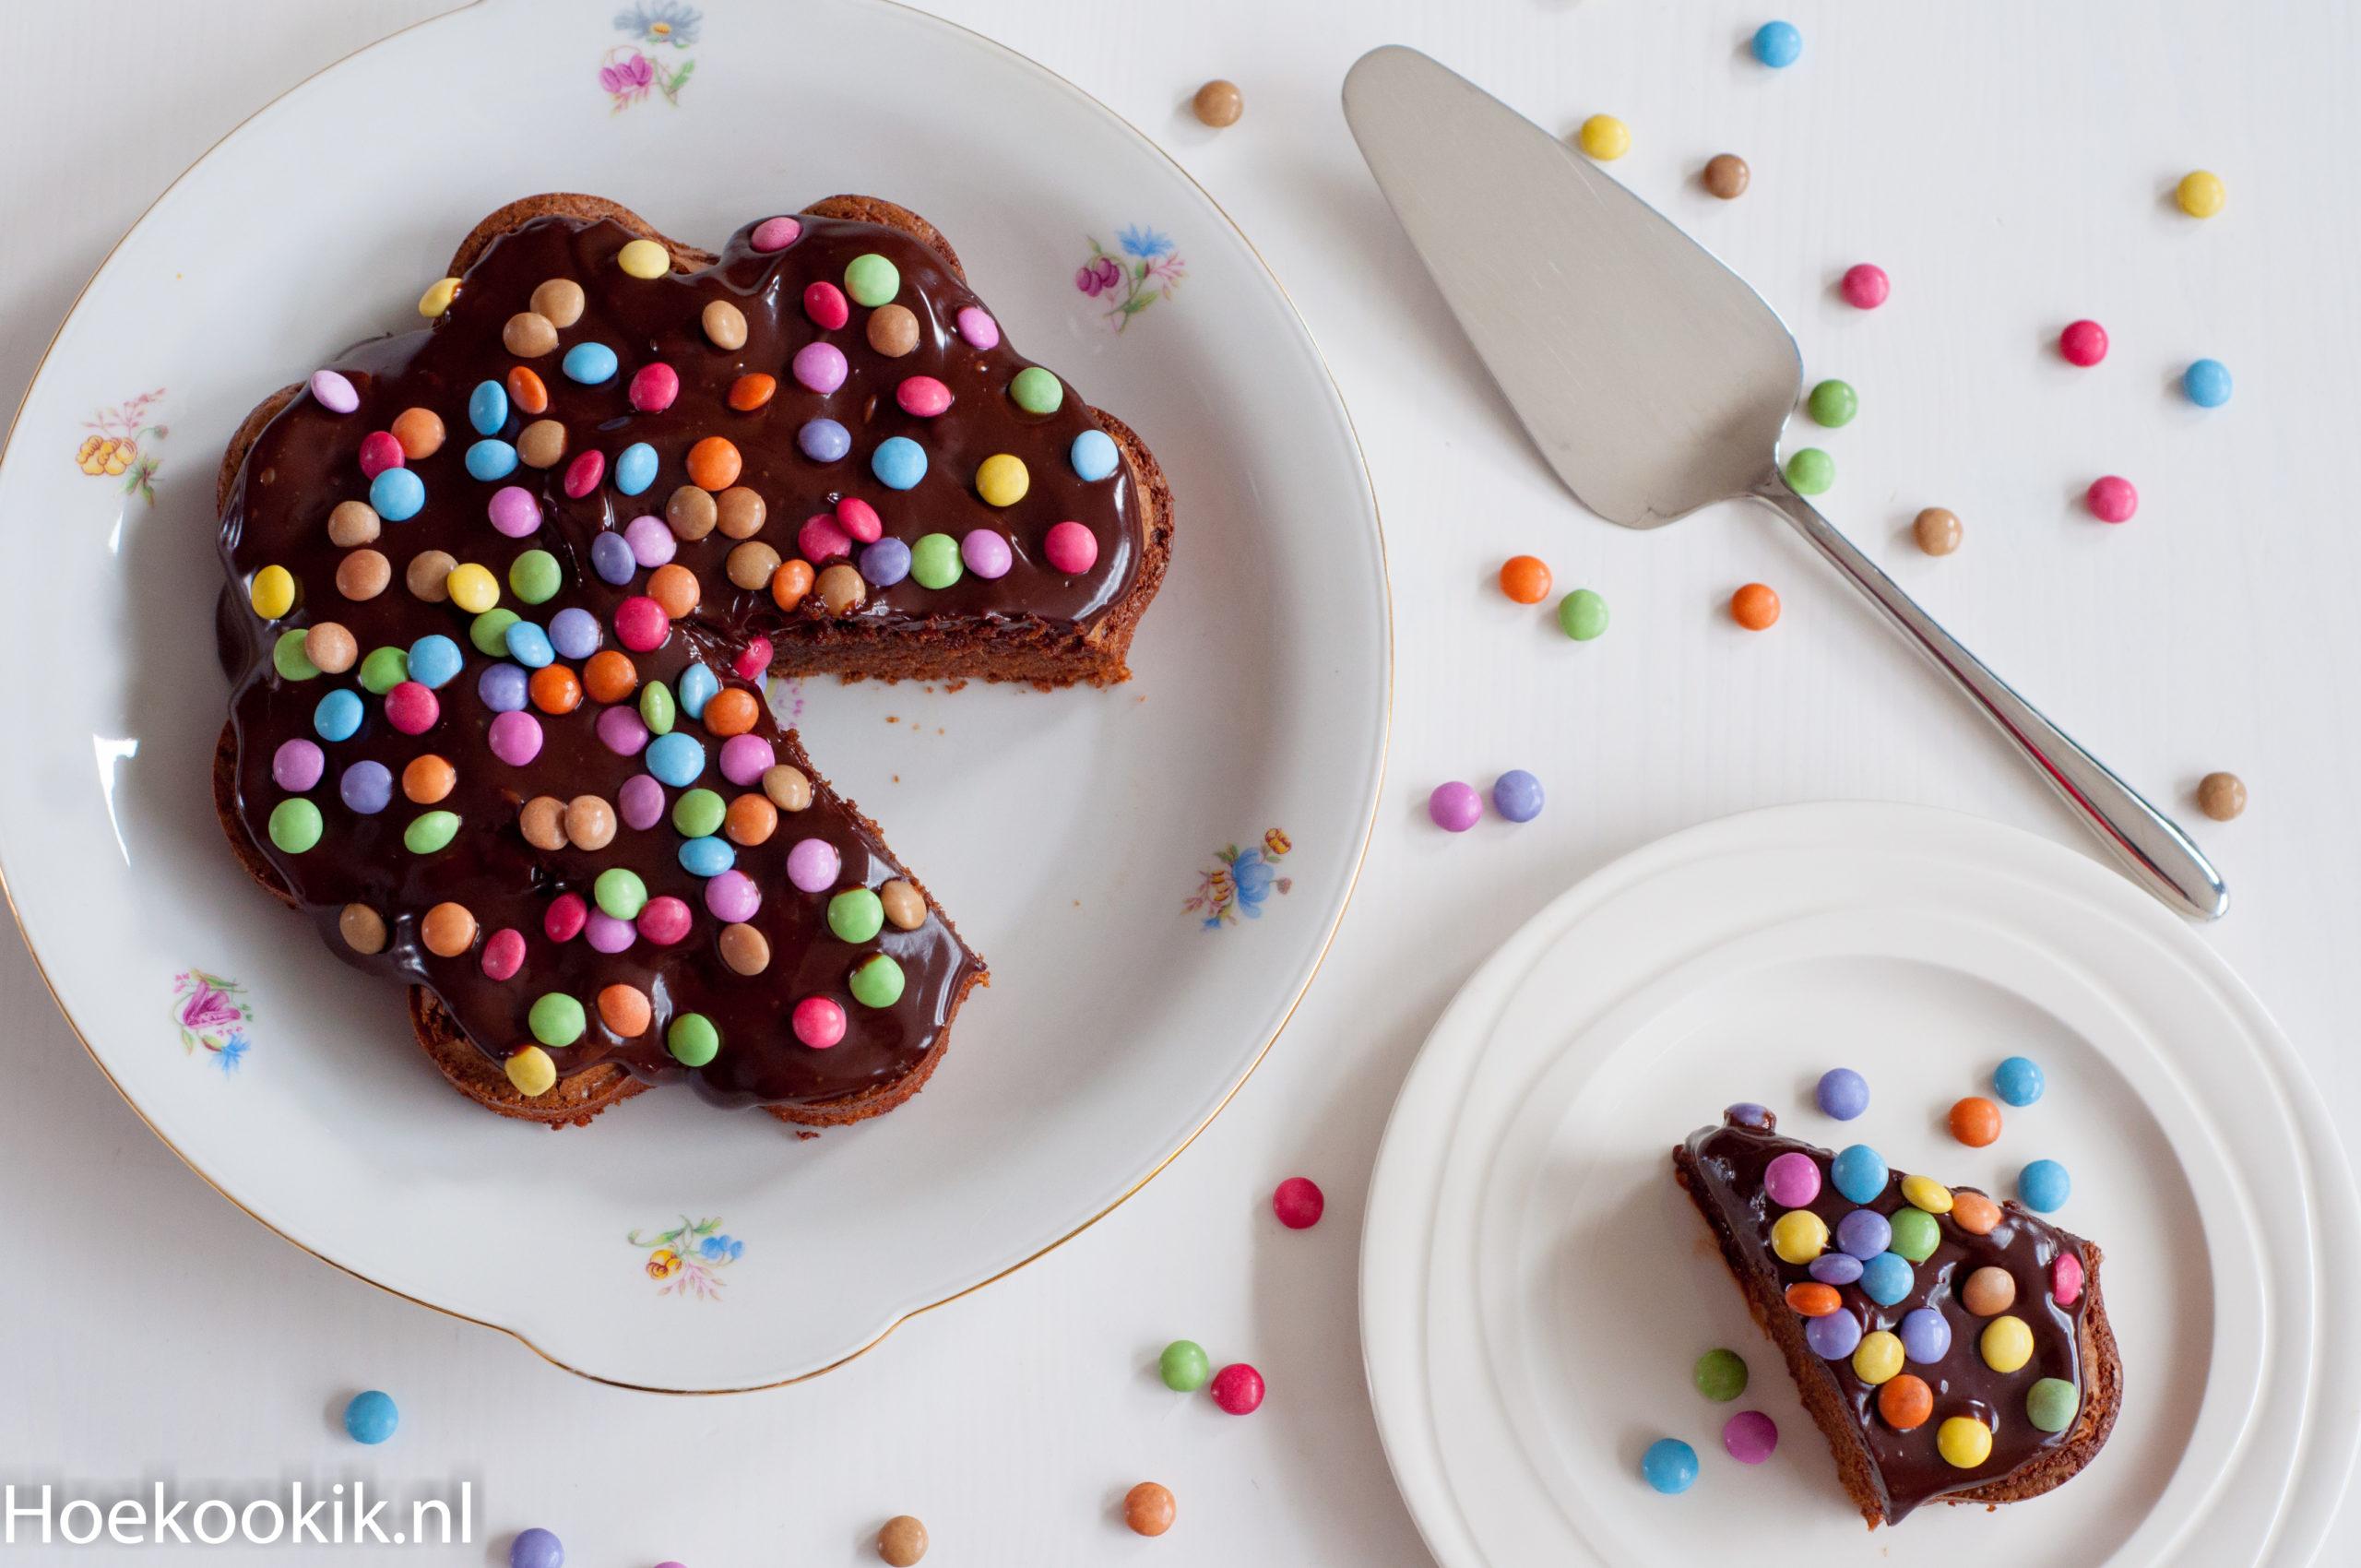 Chocoladecake met smarties